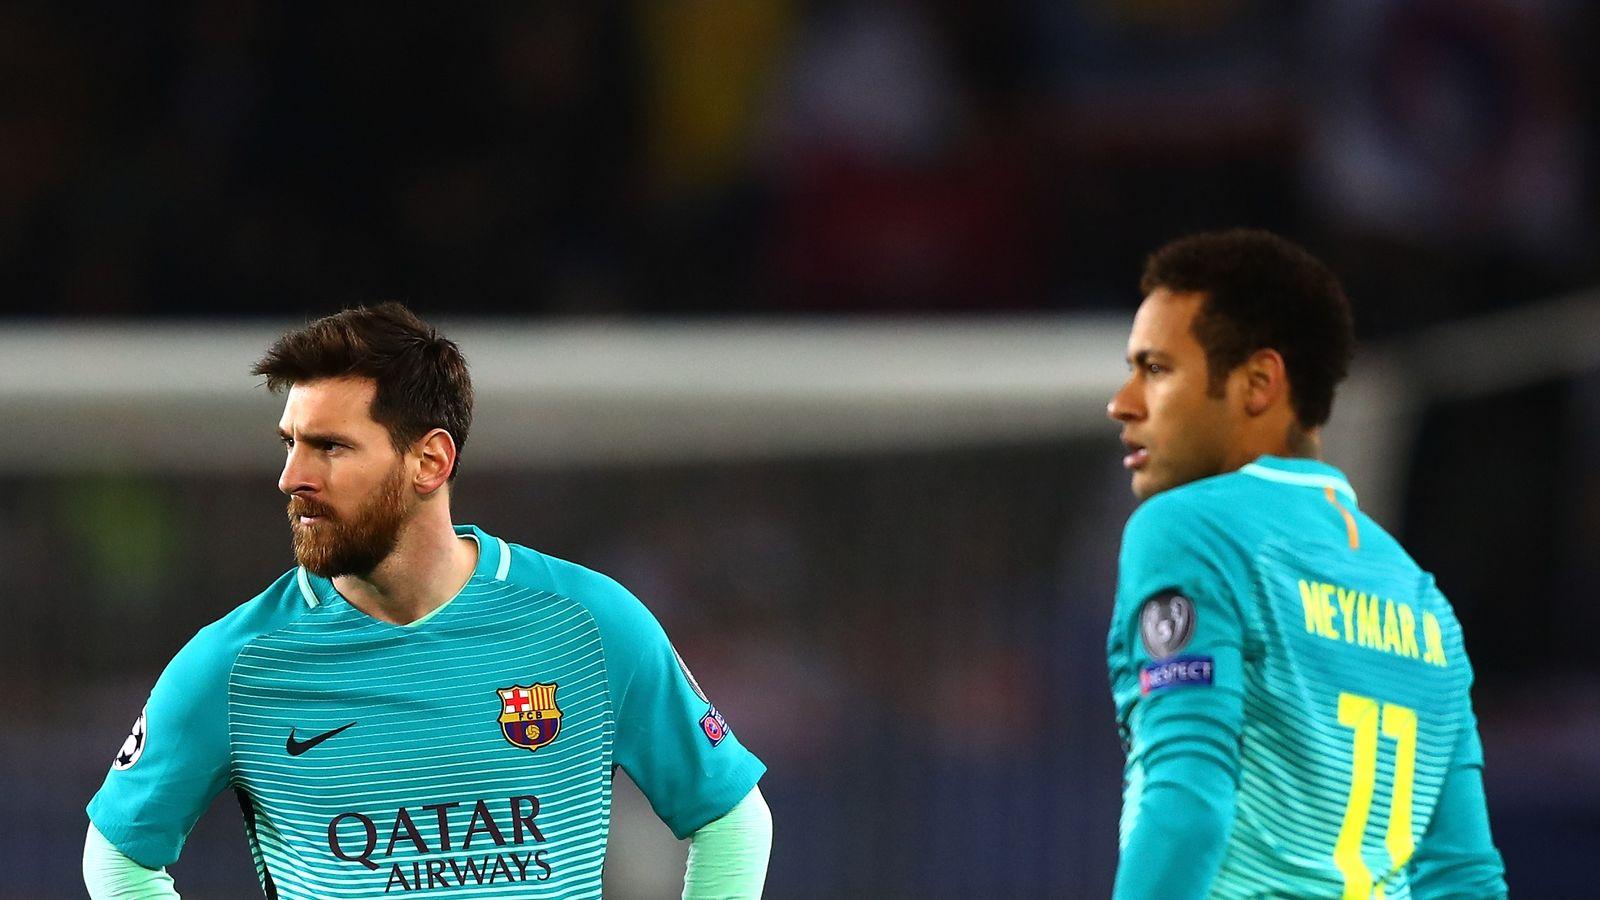 Match Preview - Barcelona vs PSG | 08 Mar 2017